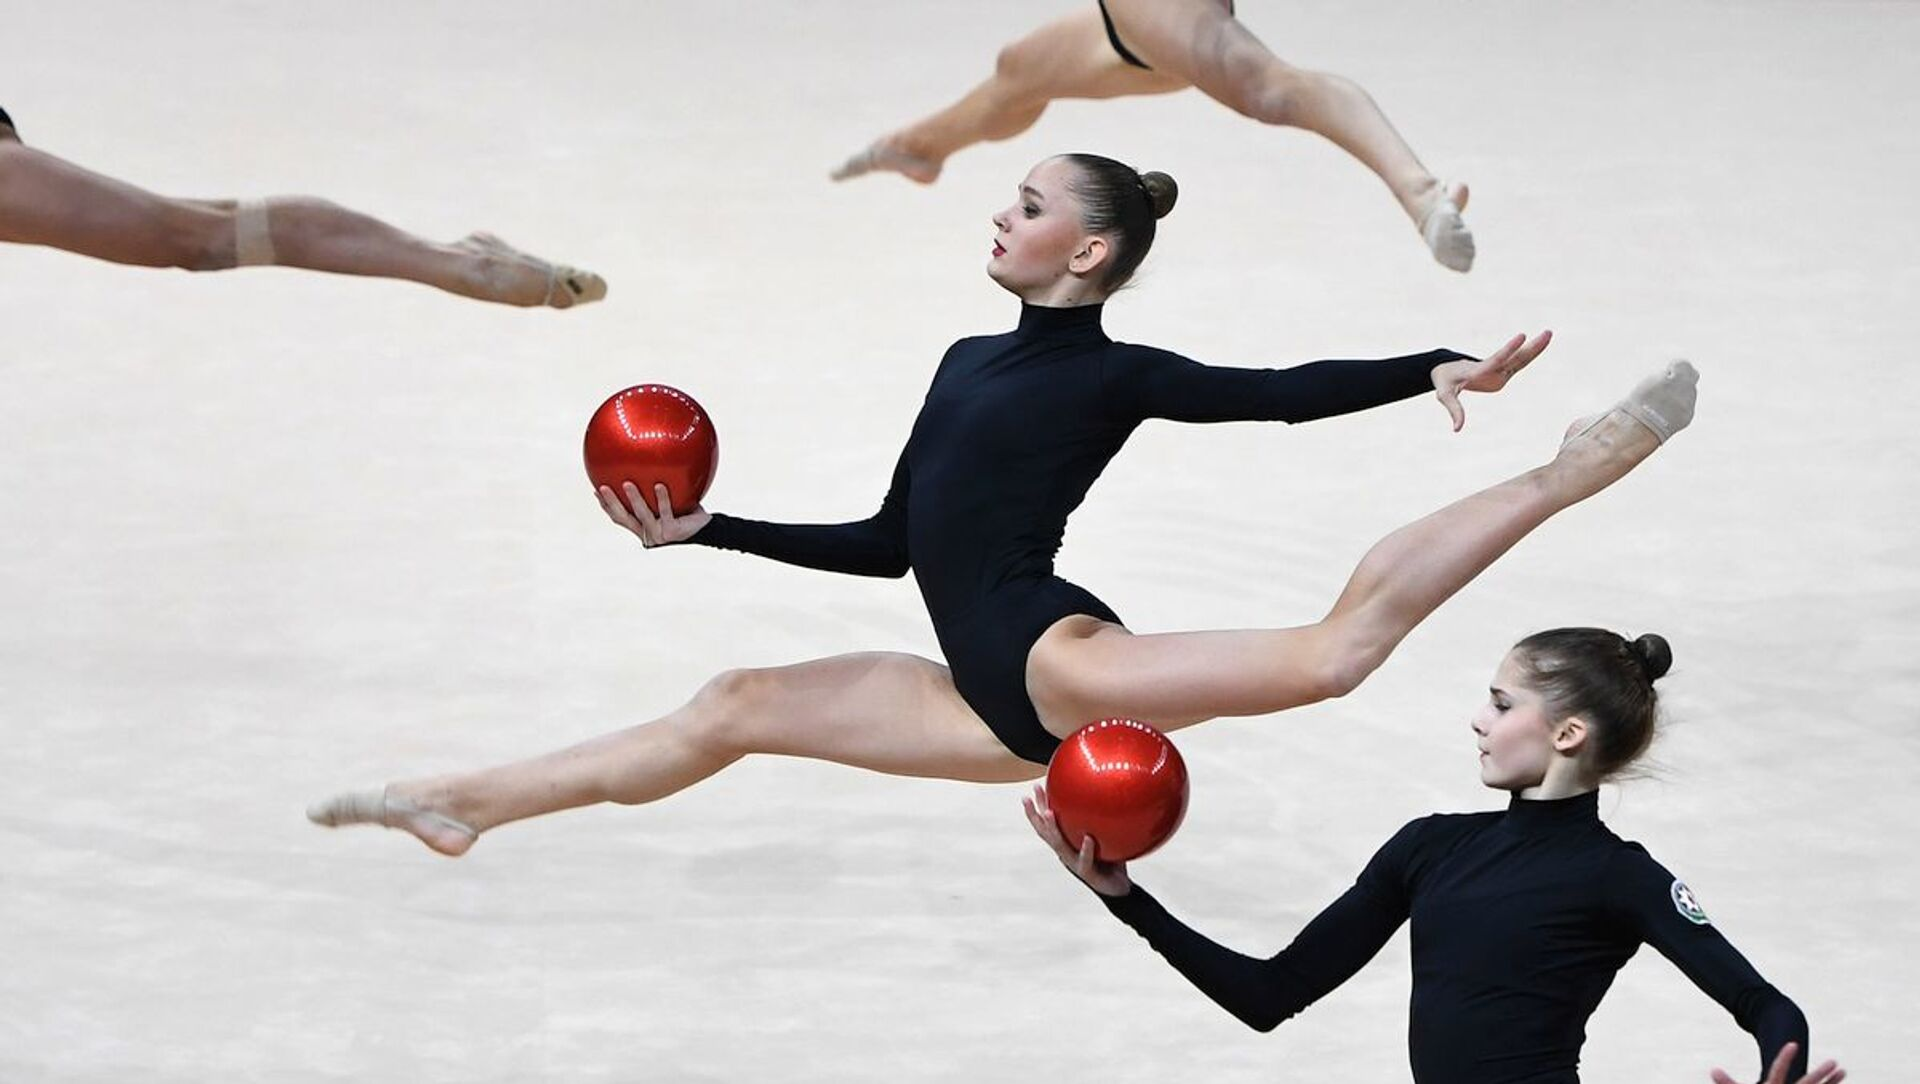 Азербайджанские гимнастки, фото из архива - Sputnik Азербайджан, 1920, 20.09.2021